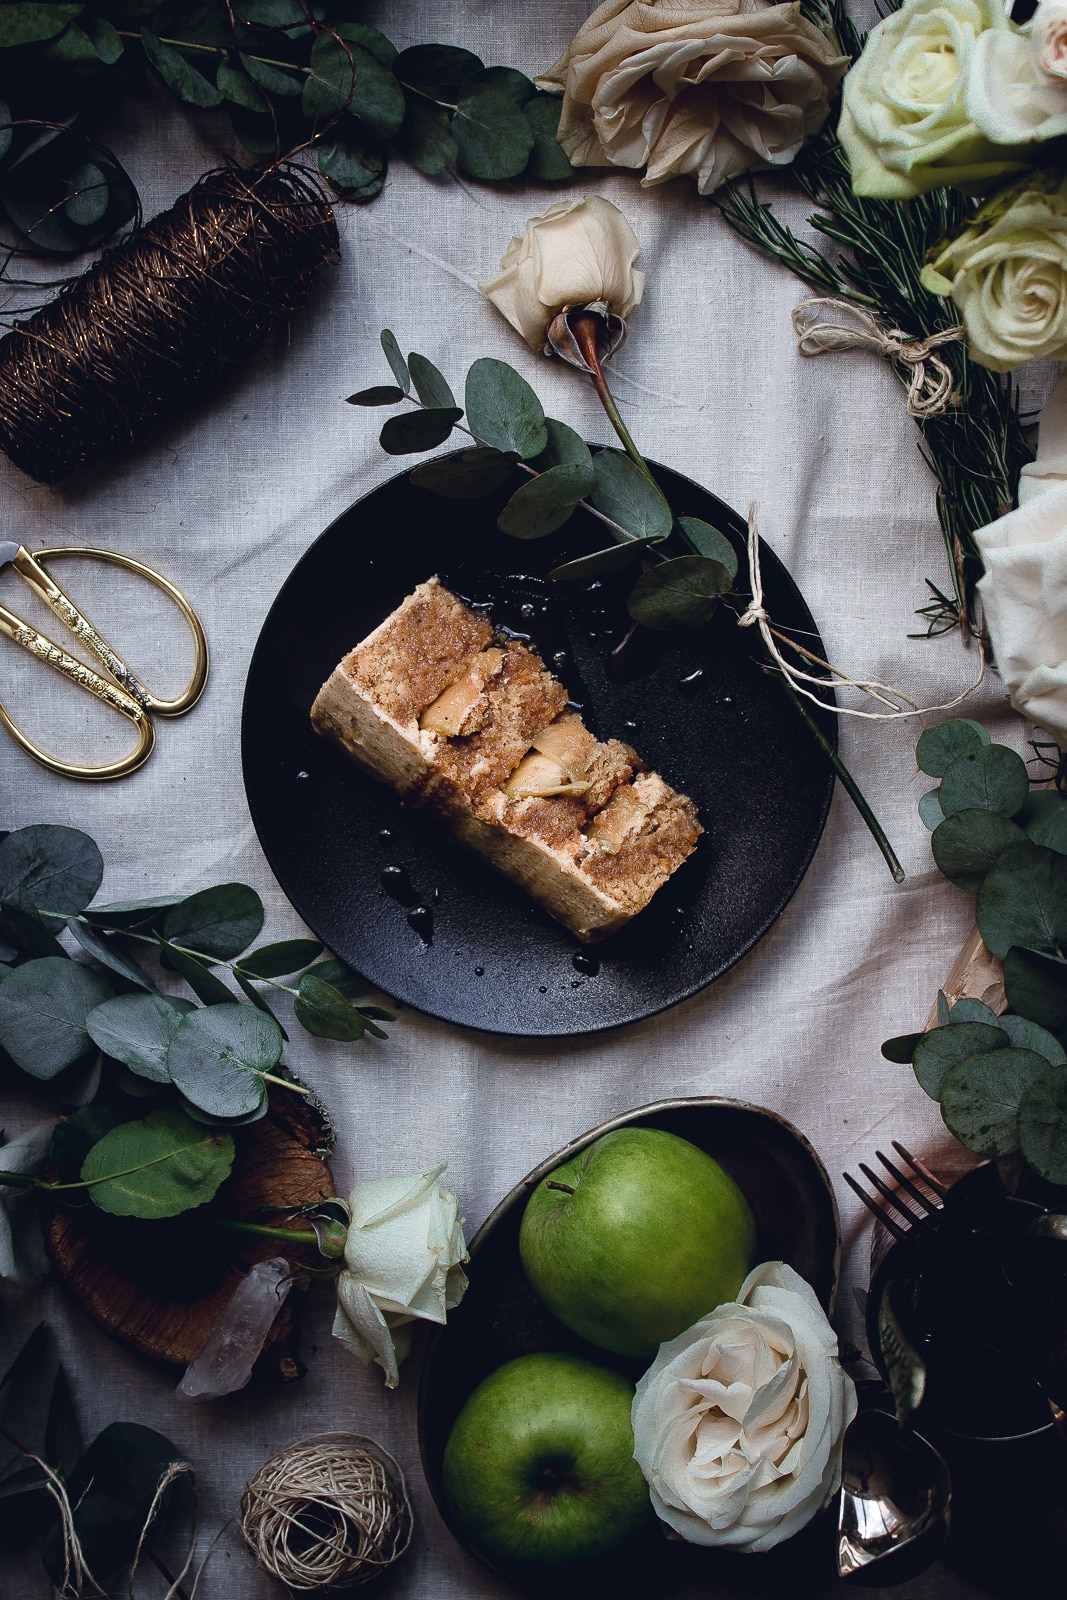 gingerbread-apple-cake-4454